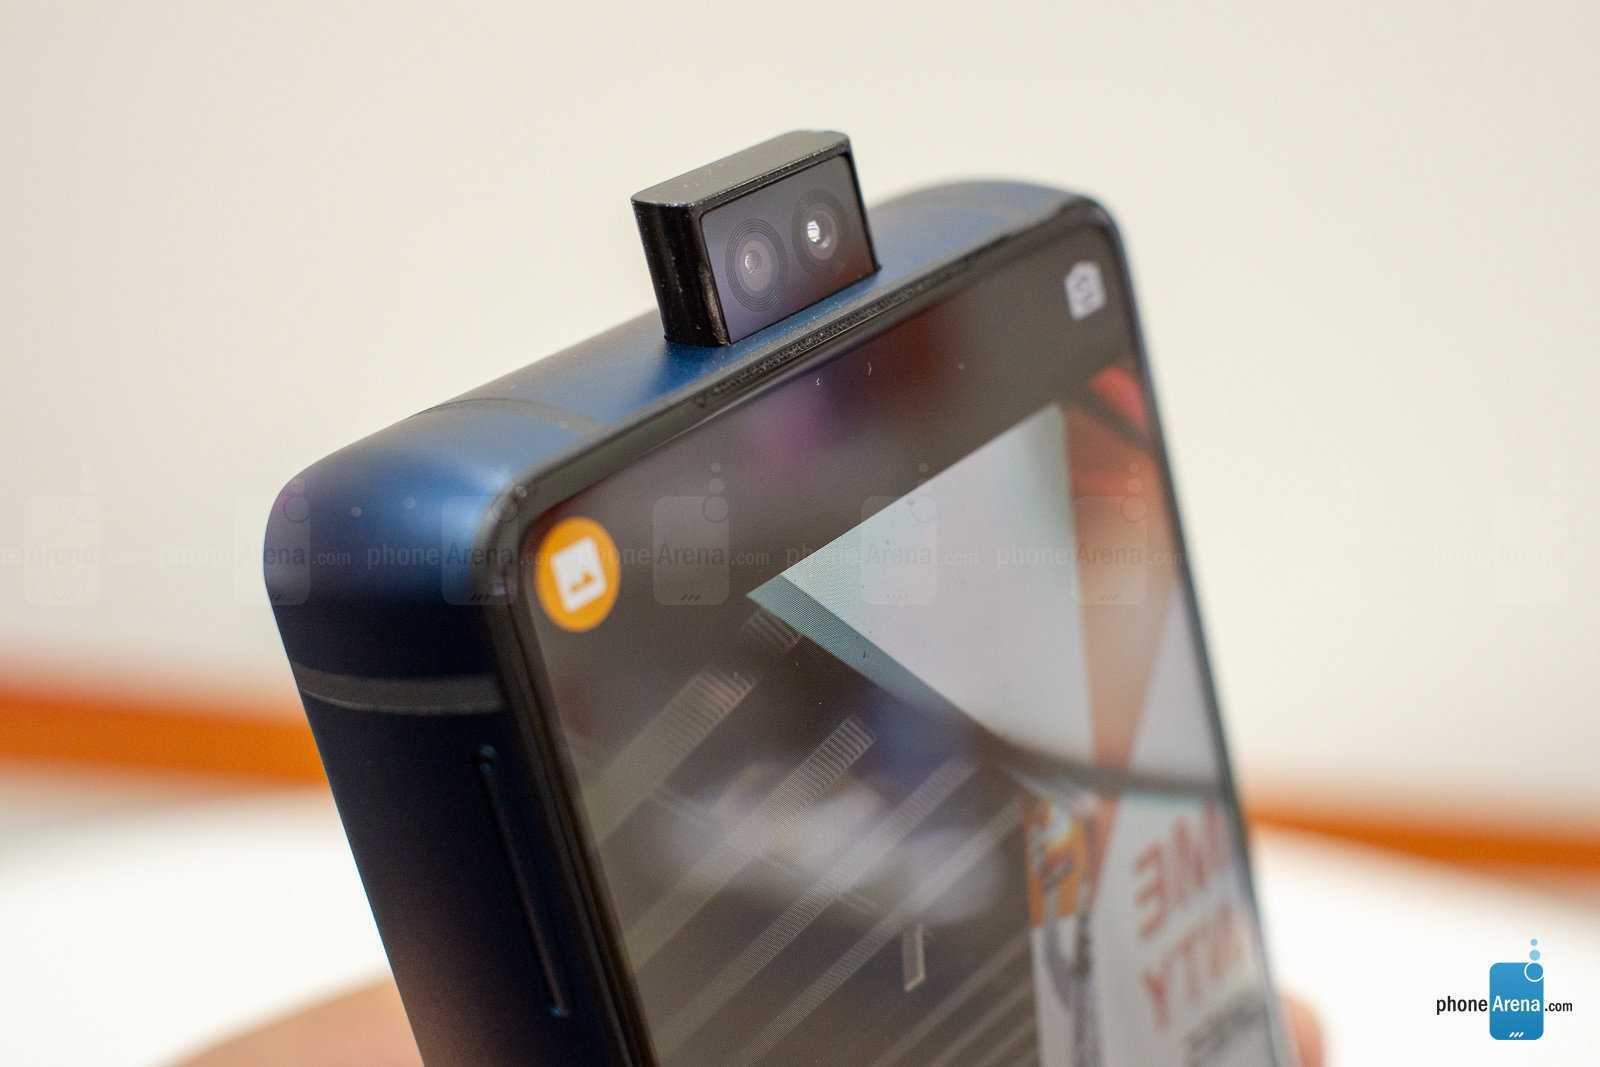 Energizer power max p18k pop — смартфон с батареей на 18 000 мач | it-need.com energizer power max p18k pop — смартфон с батареей на 18 000 мач | it-need.com